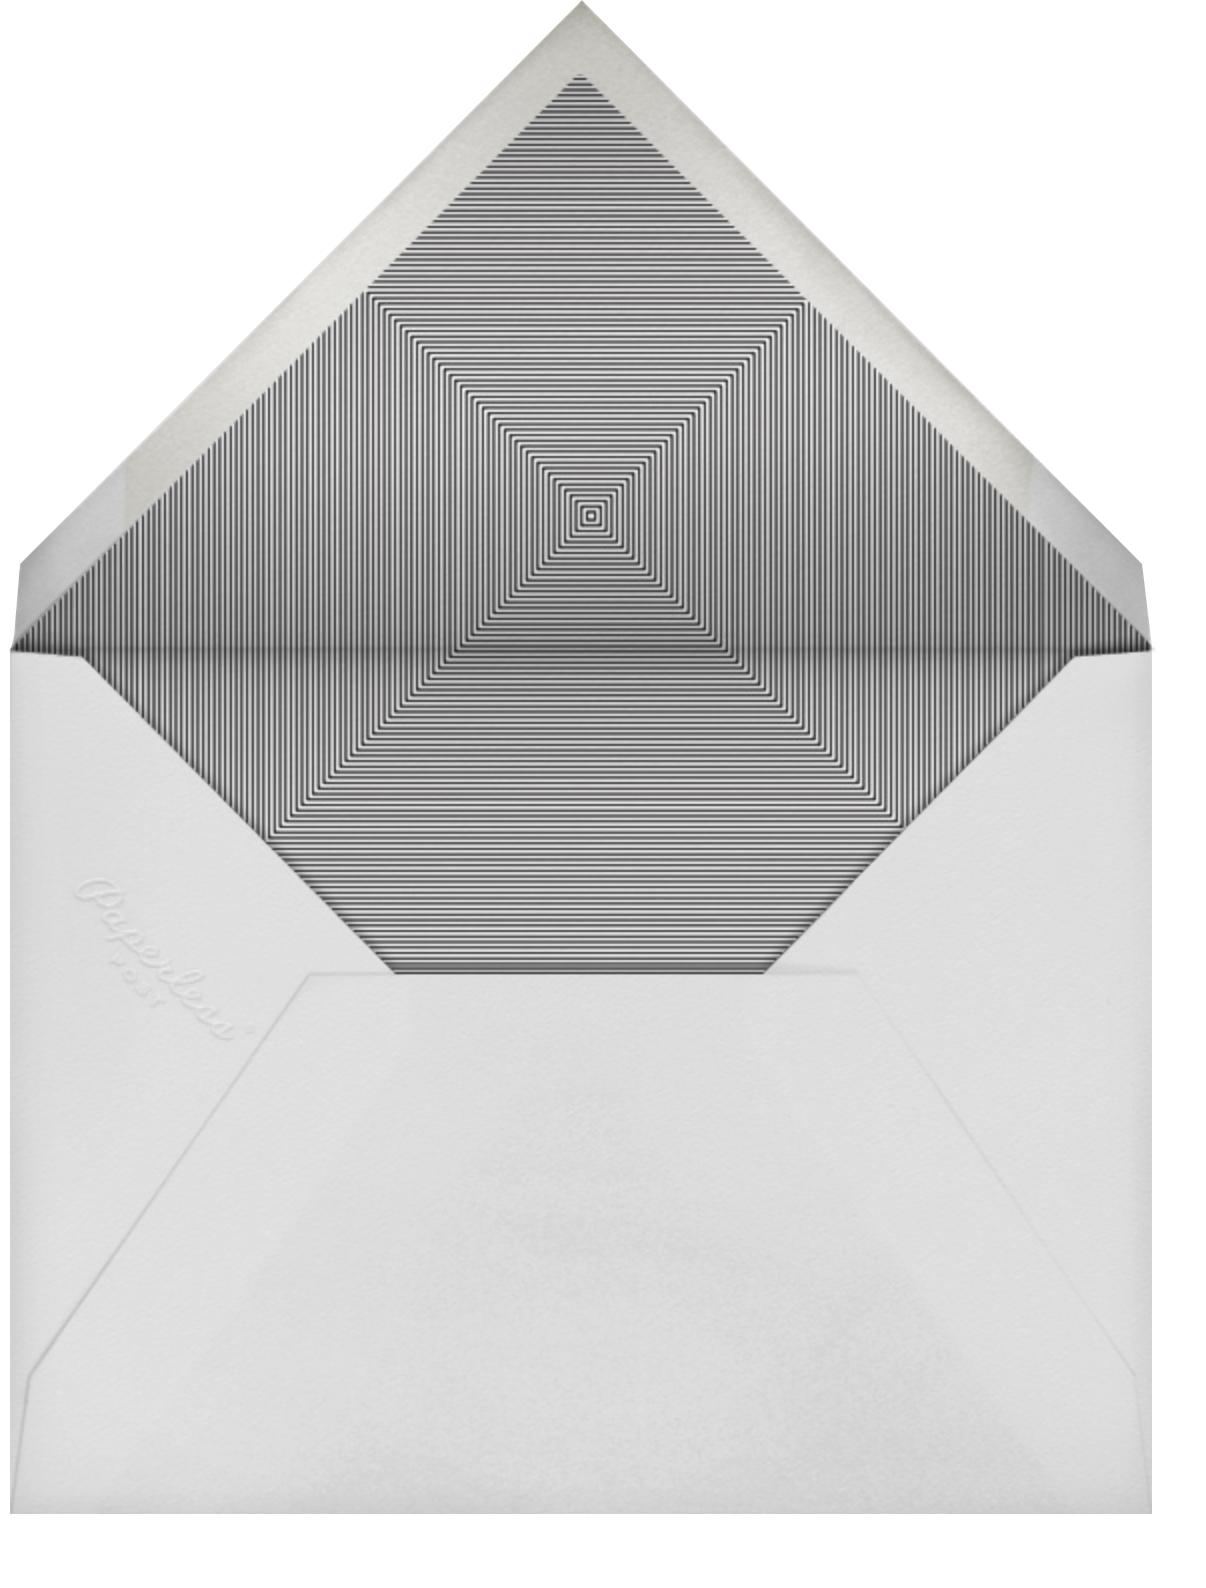 Kaleidoscope - Horizontal - Kelly Wearstler - null - envelope back